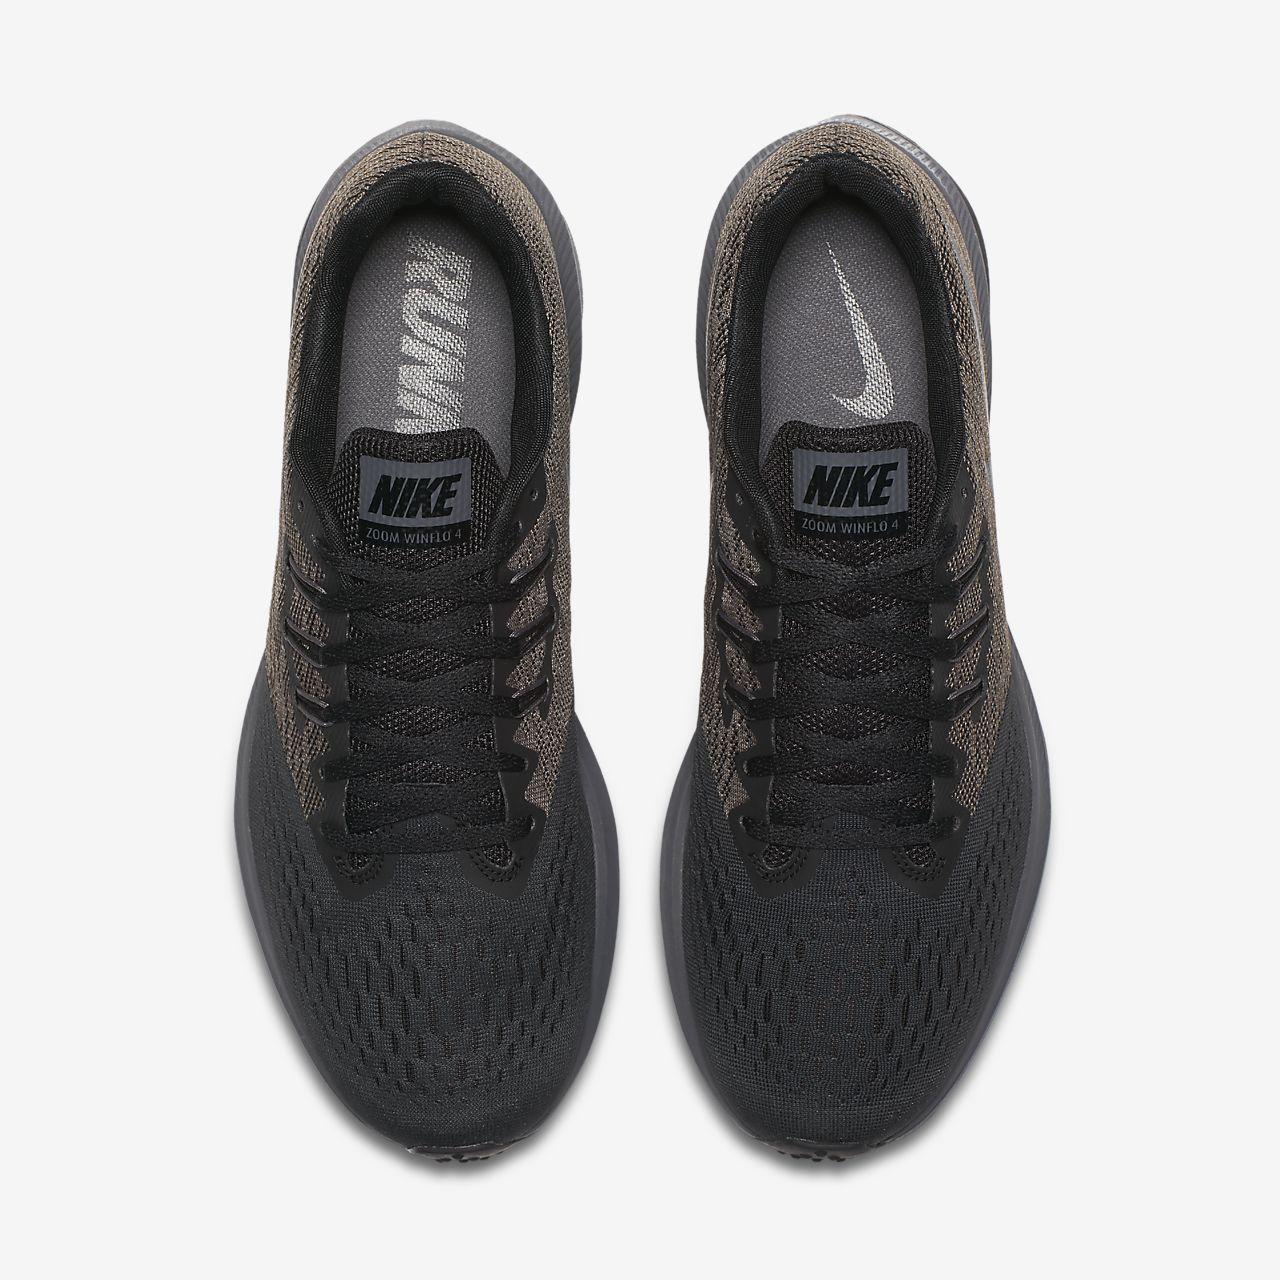 92a4a78a7be8 Nike Zoom Winflo 4 Men s Running Shoe. Nike.com AU